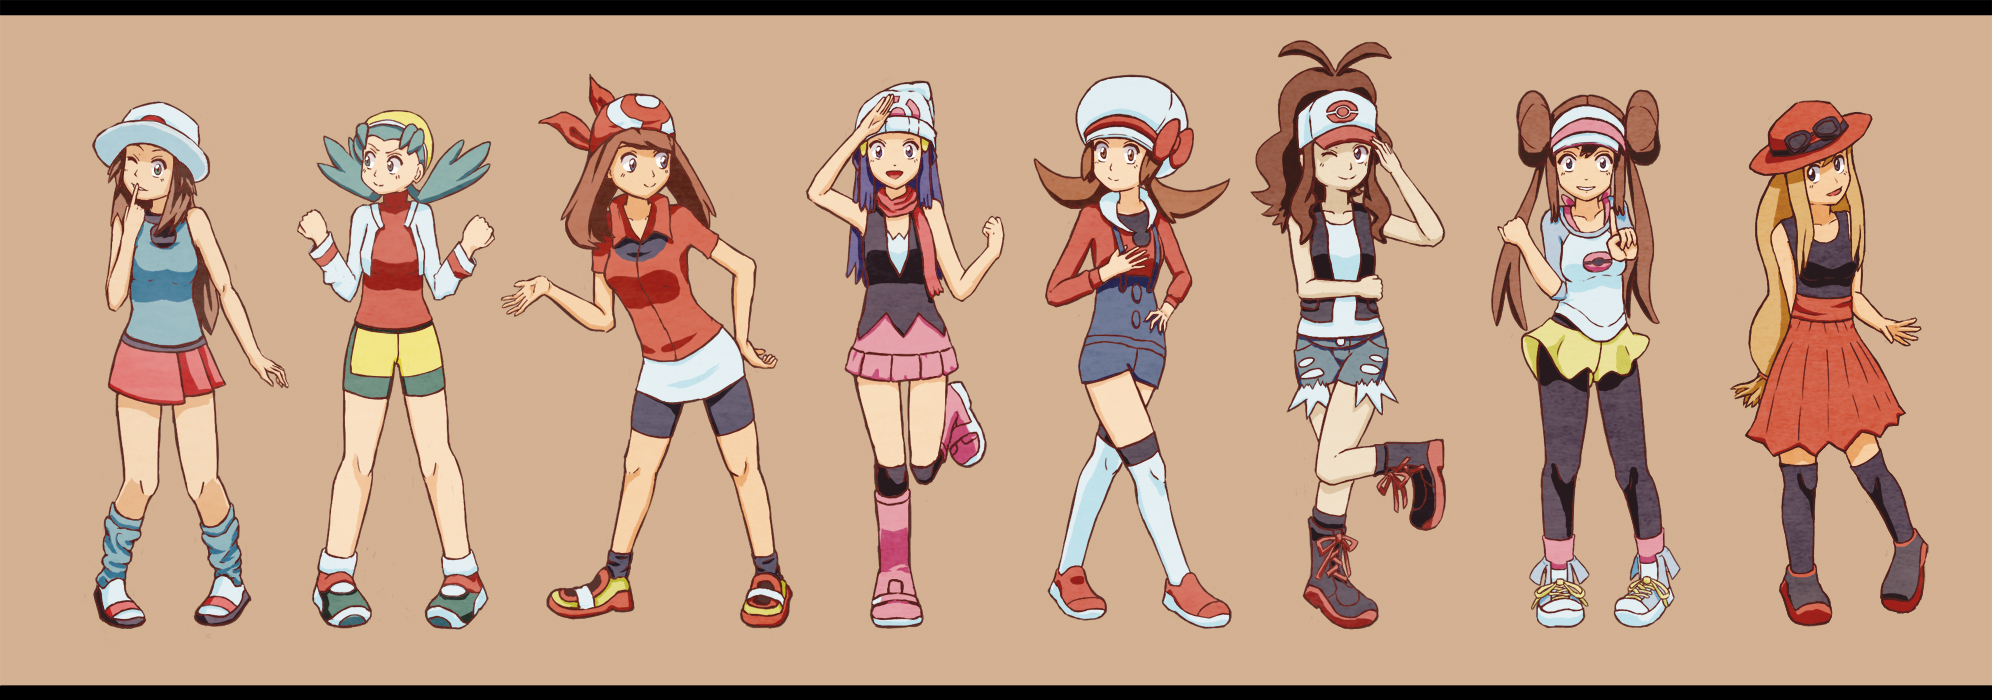 Characters Images Silver Pigstruction: Pokémon Image #1463187